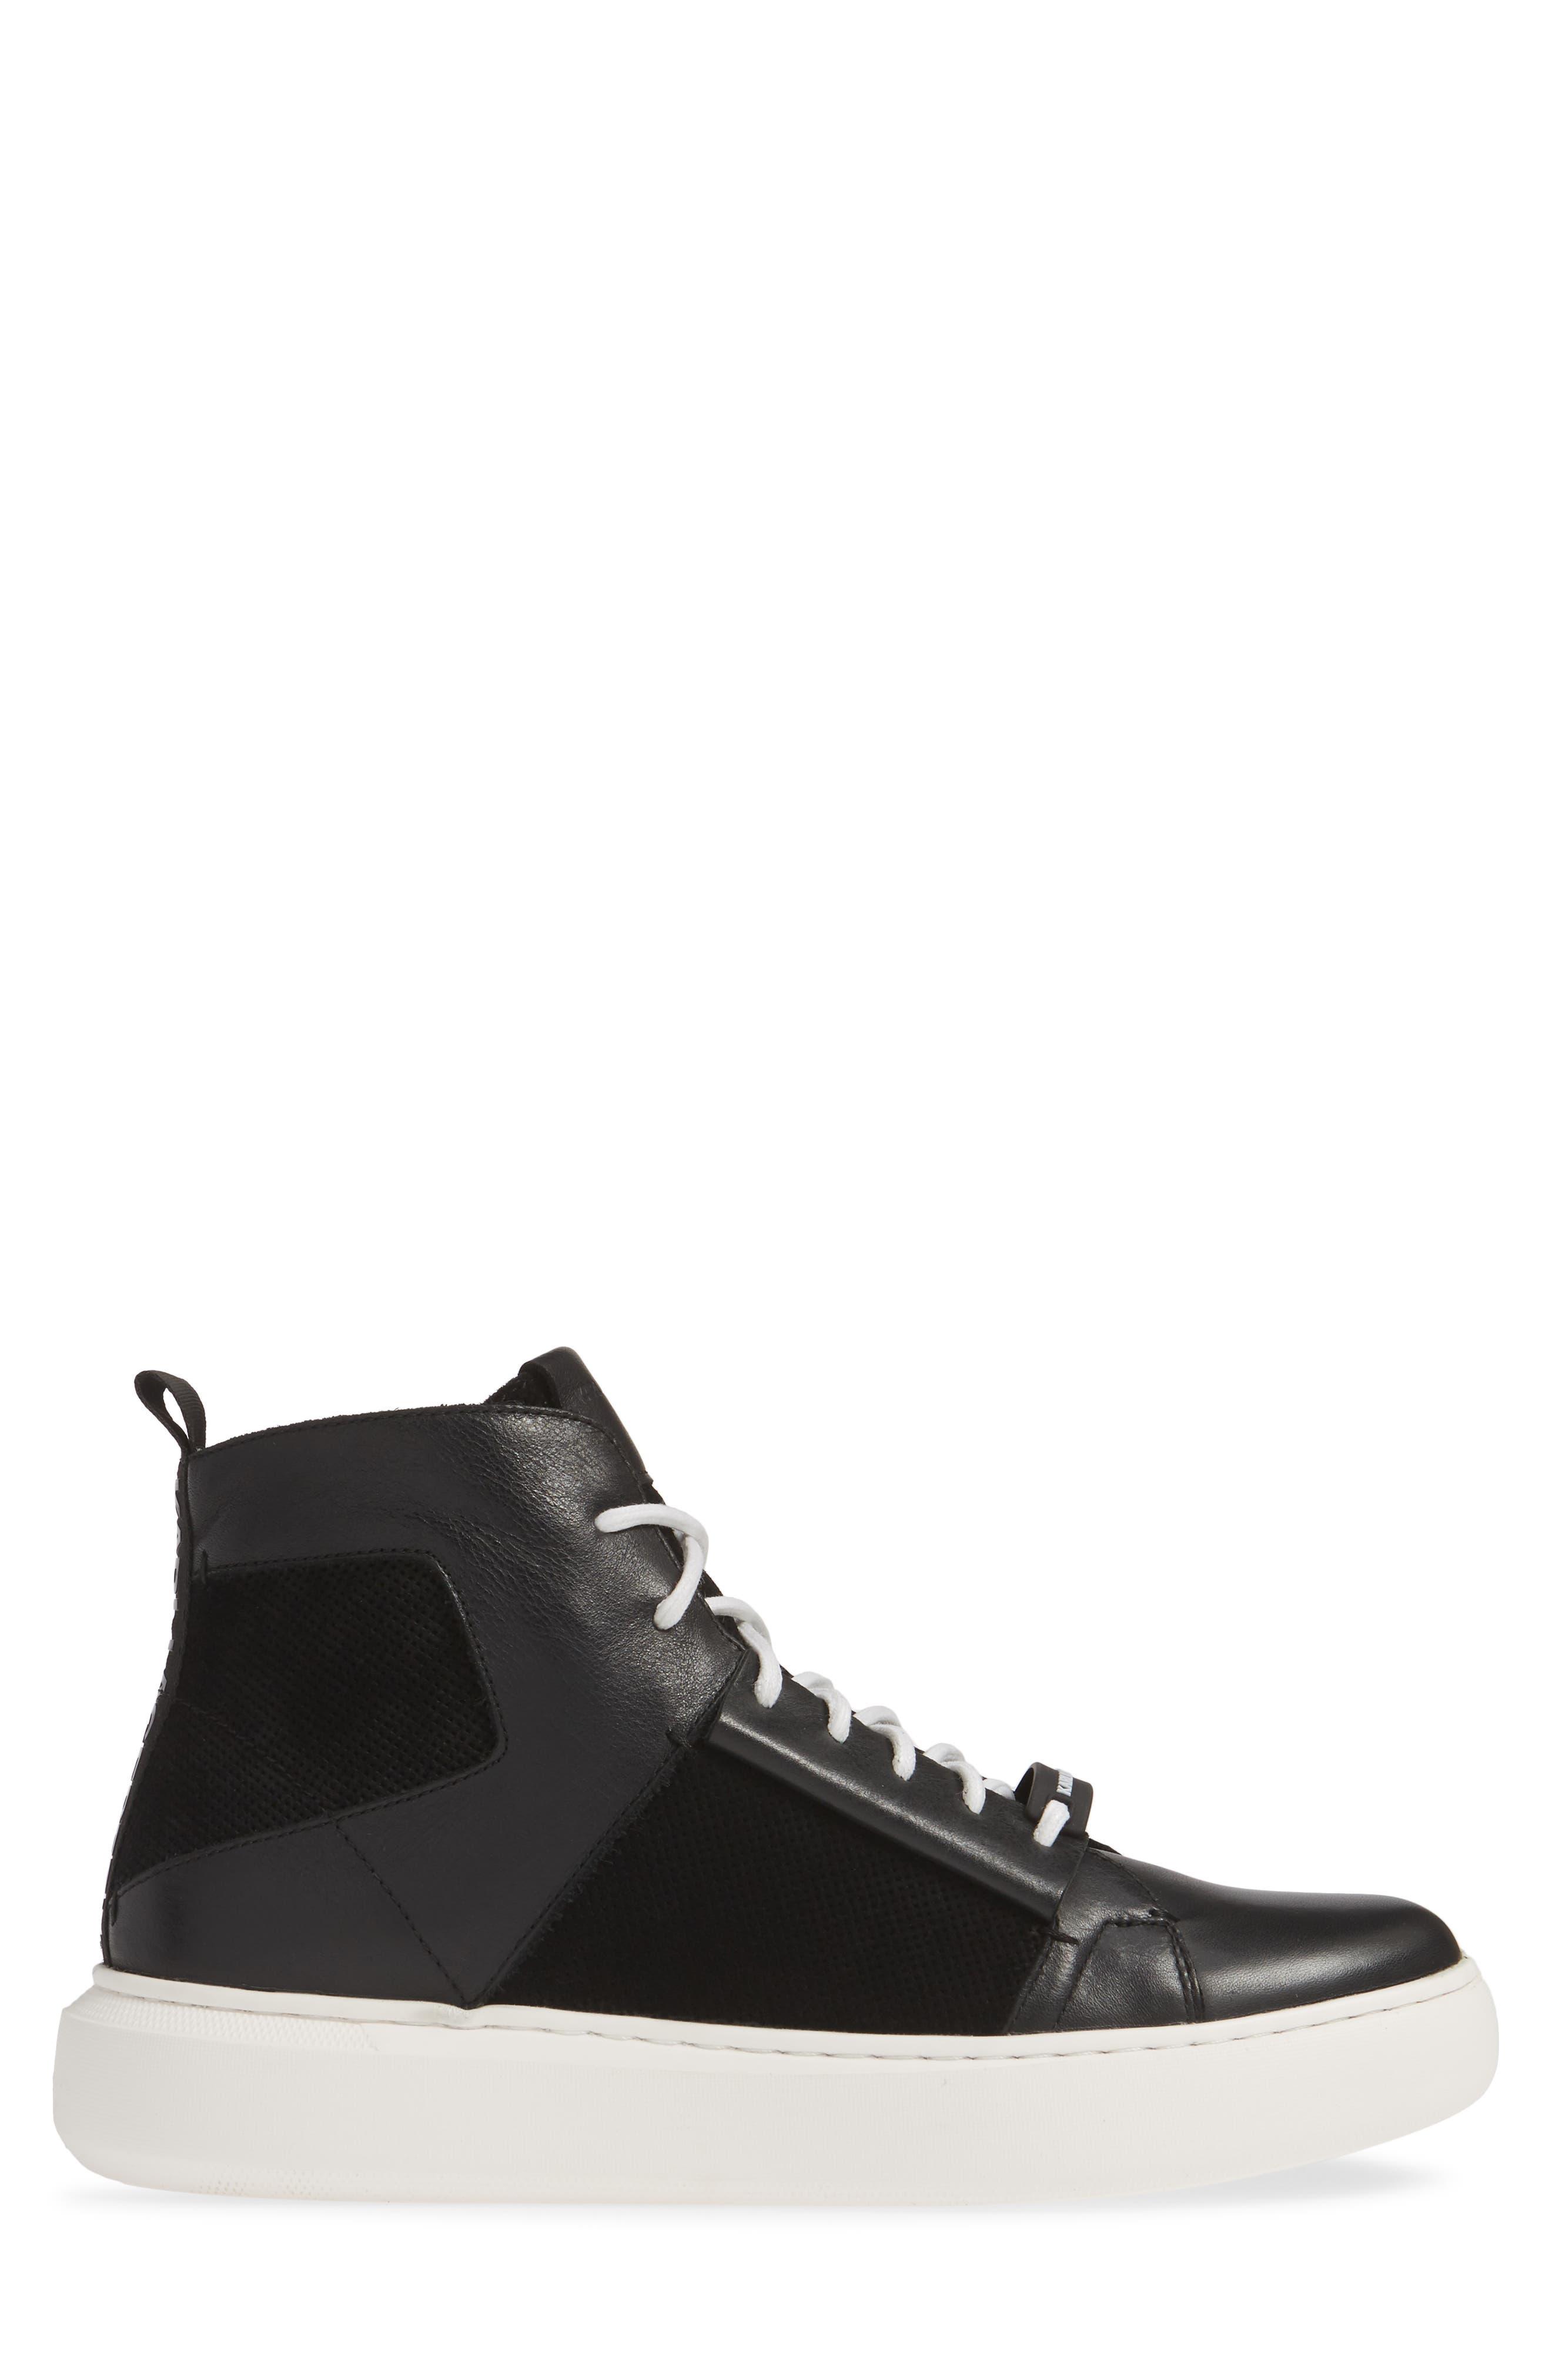 KARL LAGERFELD PARIS, High Top Sneaker, Alternate thumbnail 3, color, BLACK LEATHER